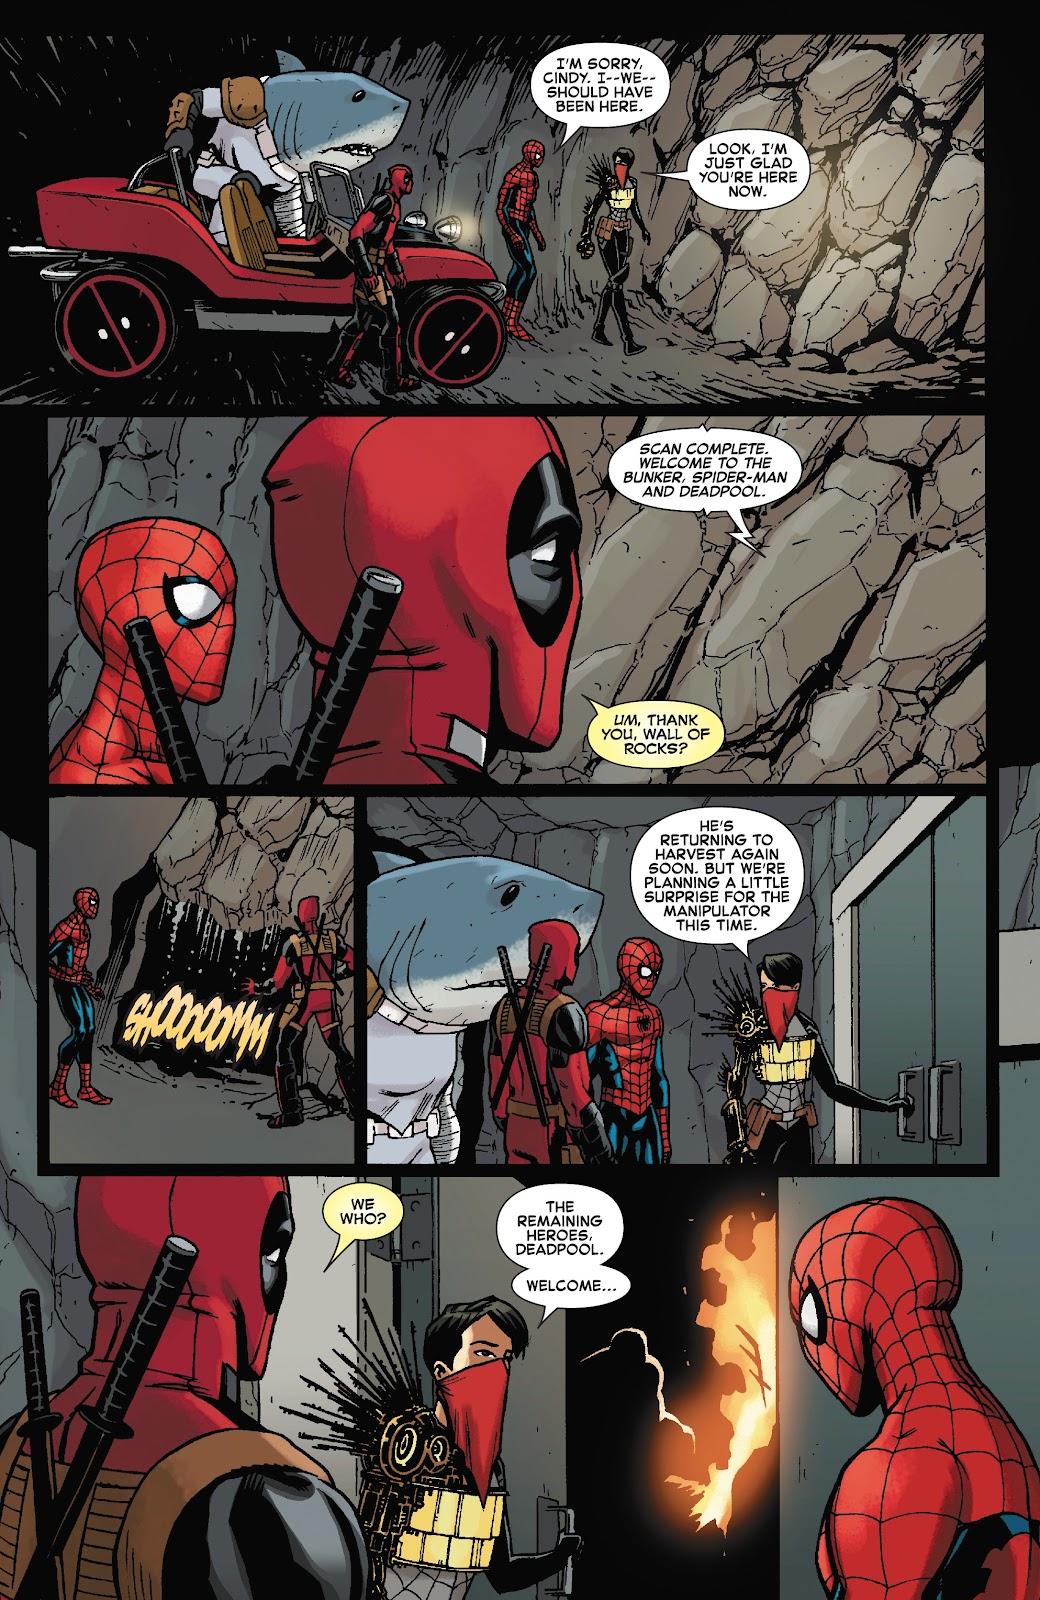 Read online Spider-Man/Deadpool comic -  Issue #46 - 21